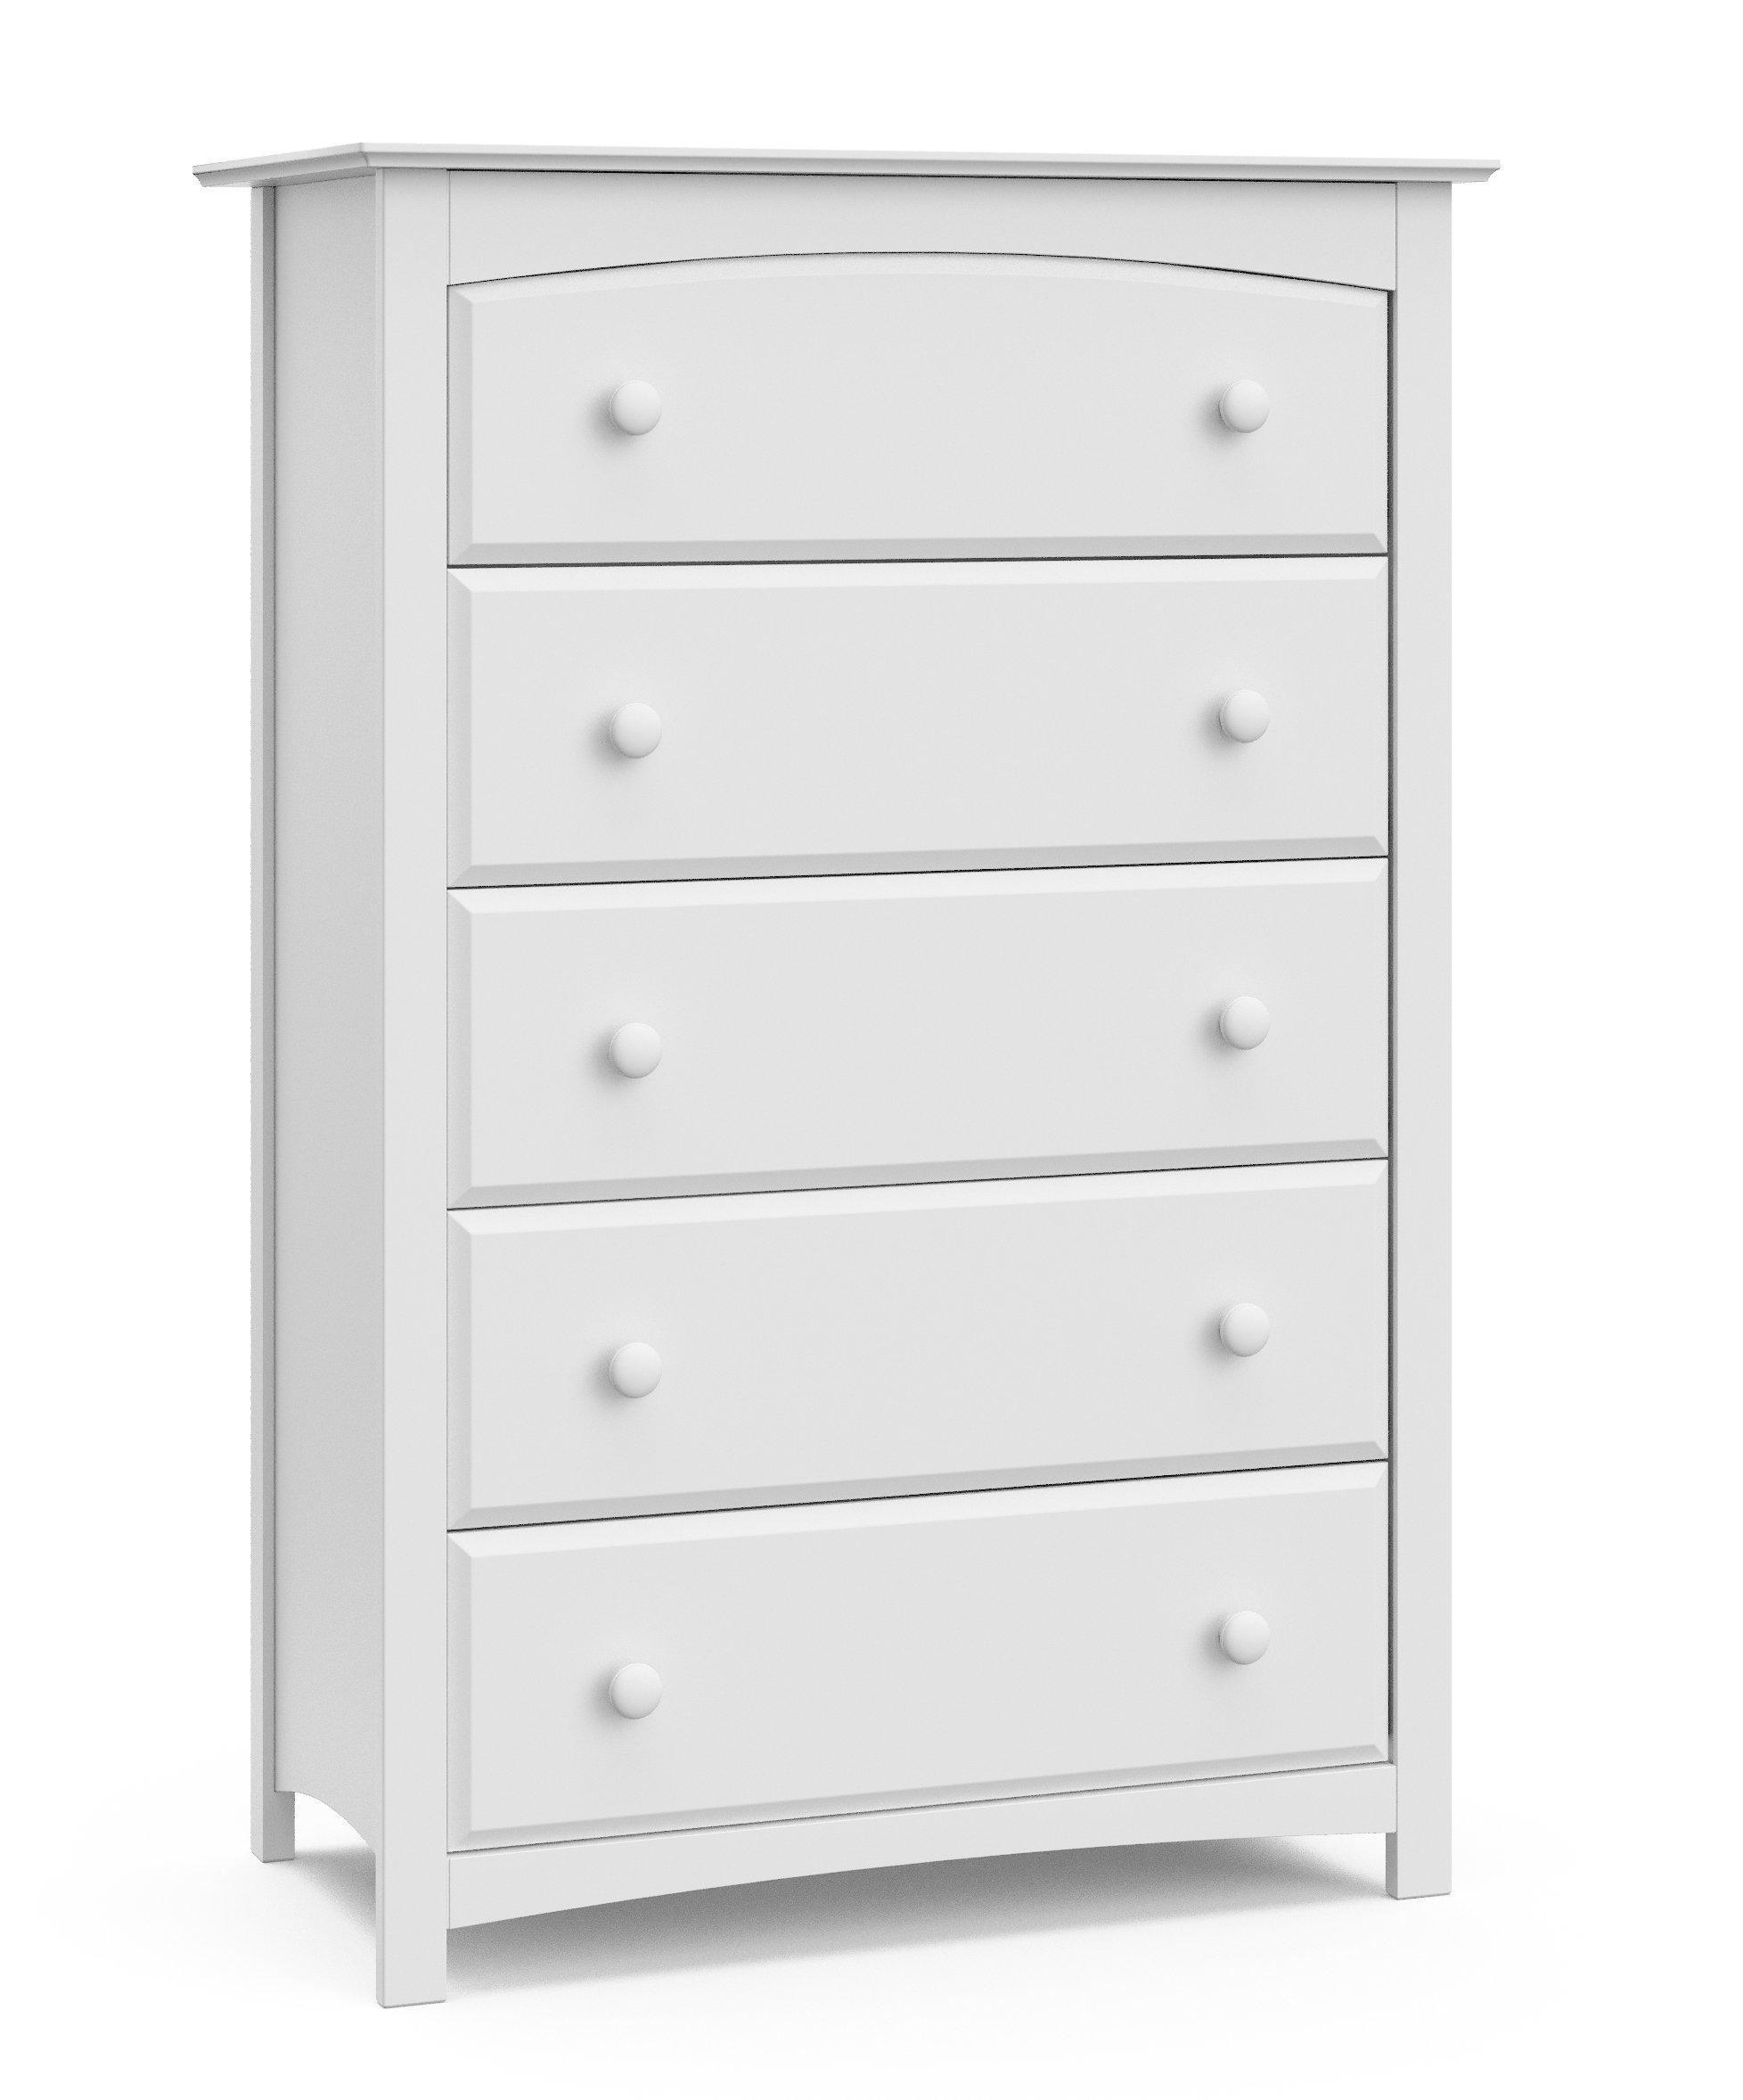 Stork Craft Kenton 5 Drawer Universal Dresser, White by Storkcraft